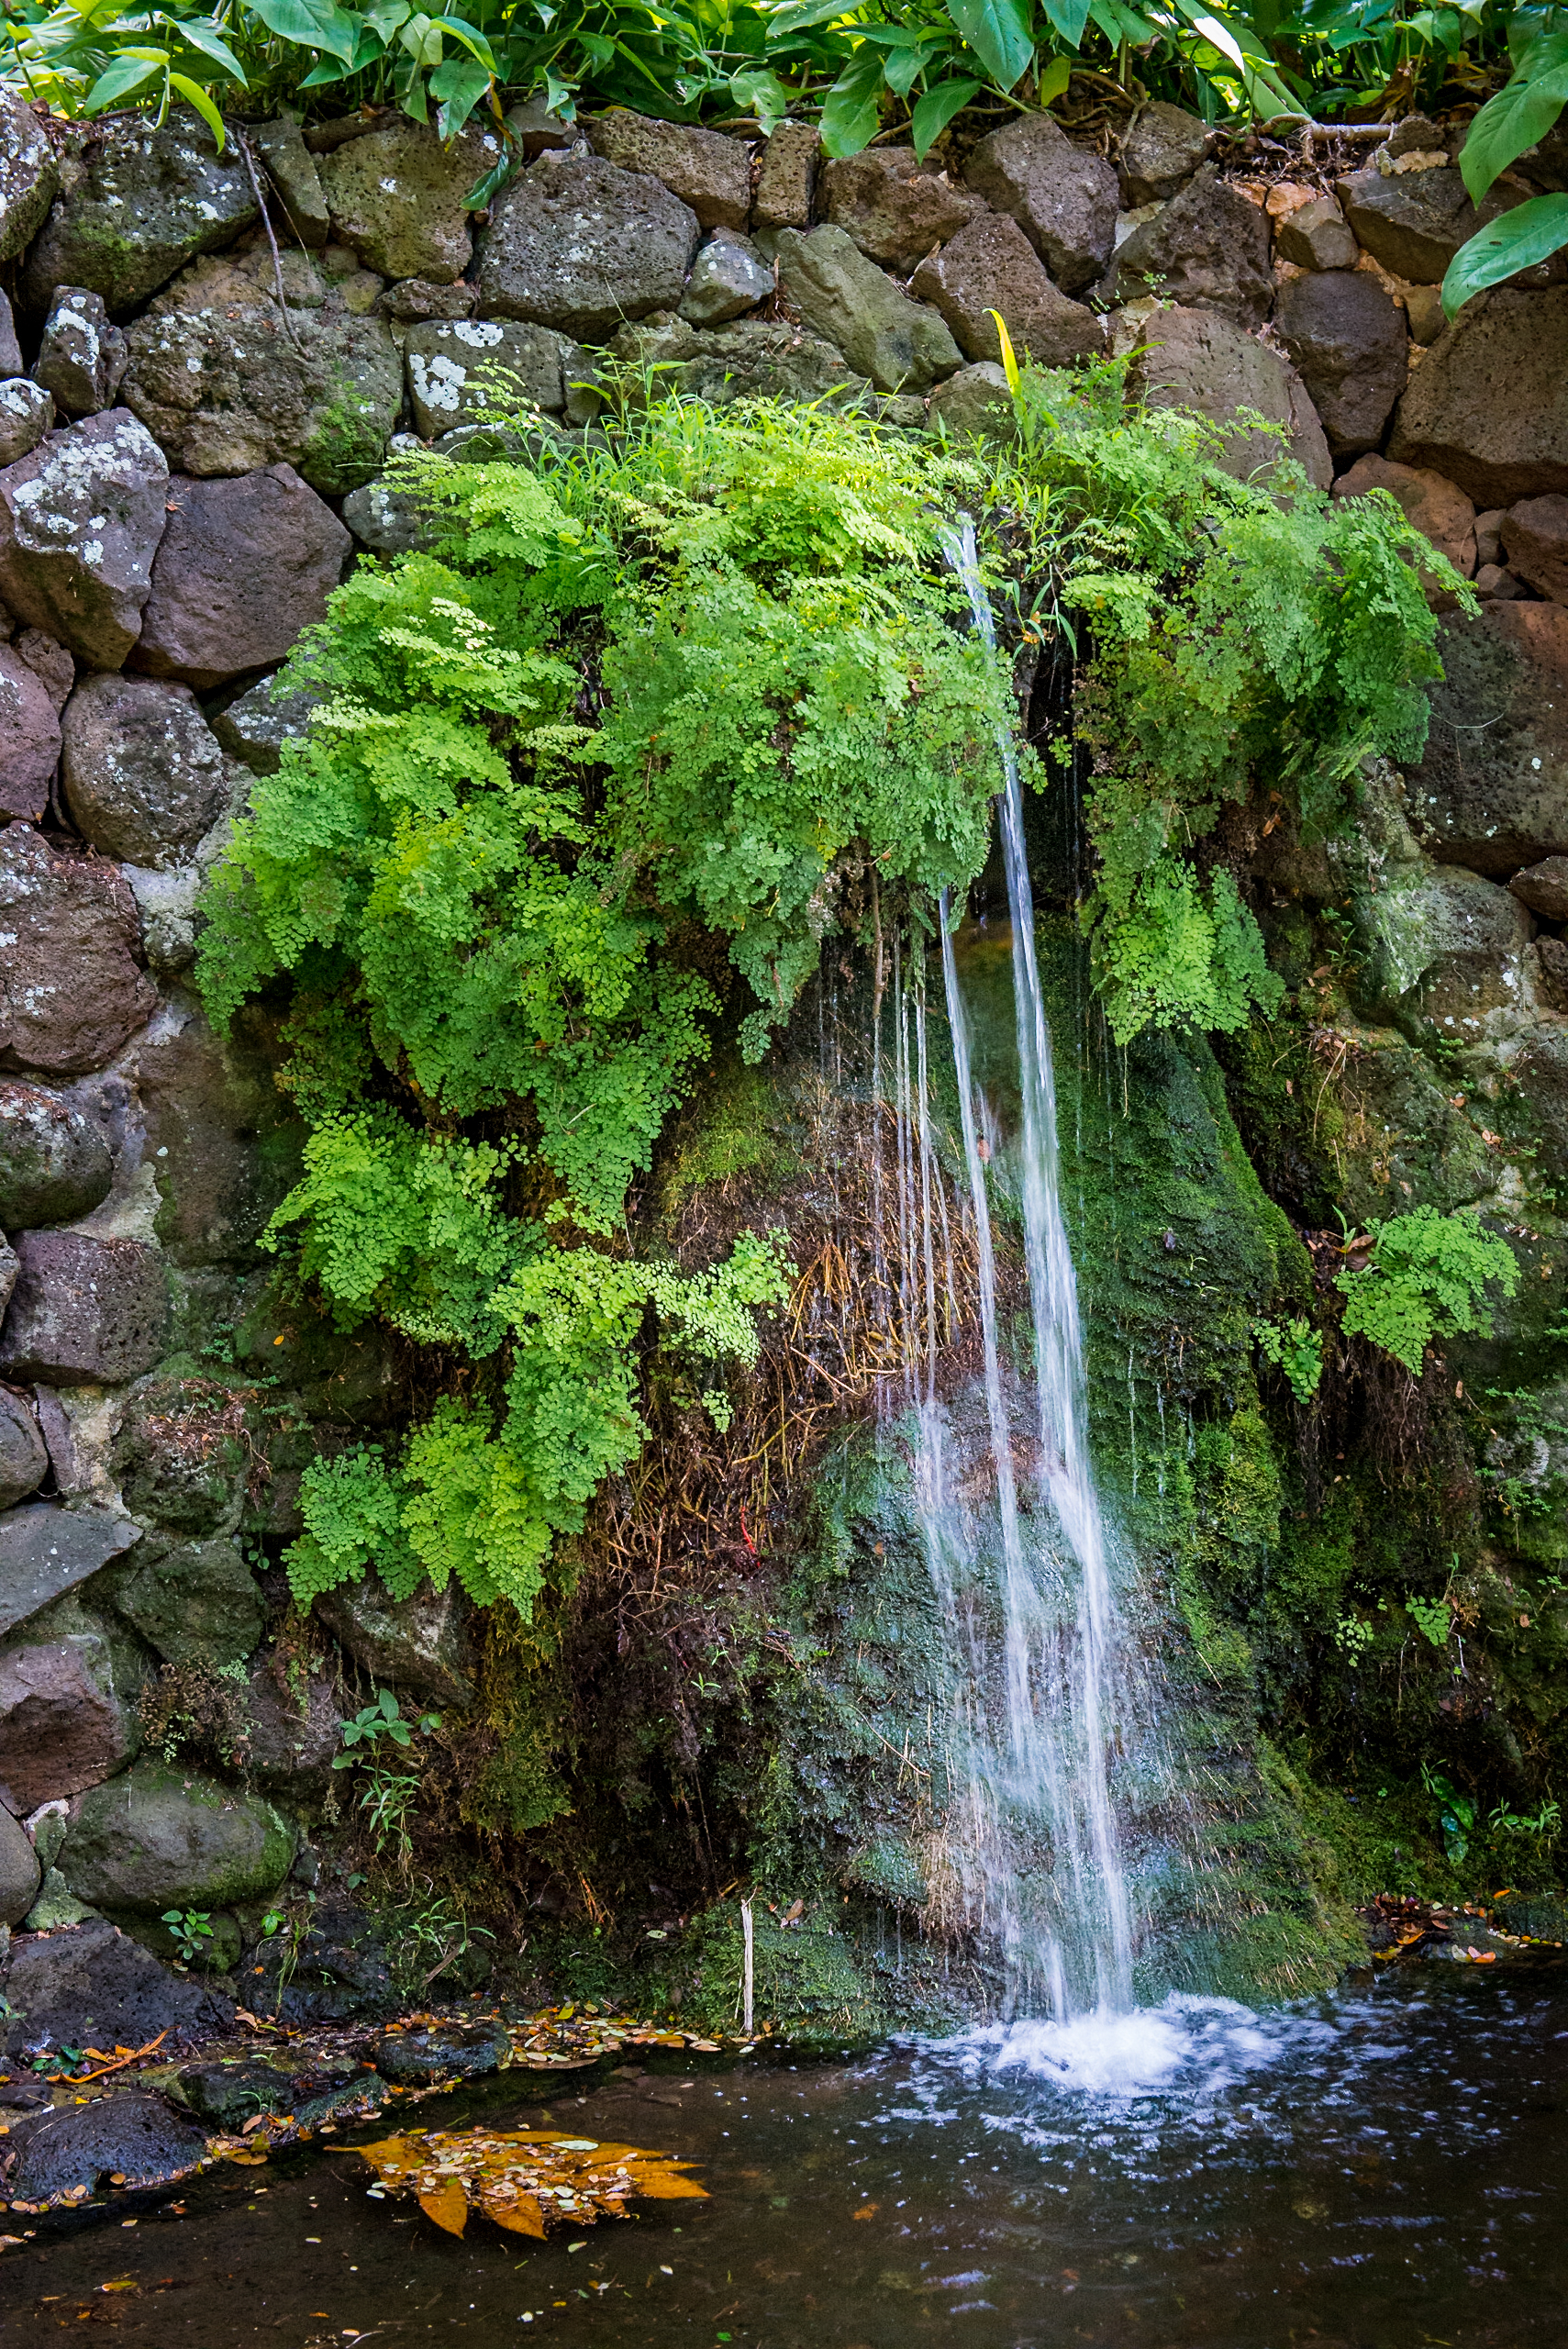 Trickling Waterfall 1